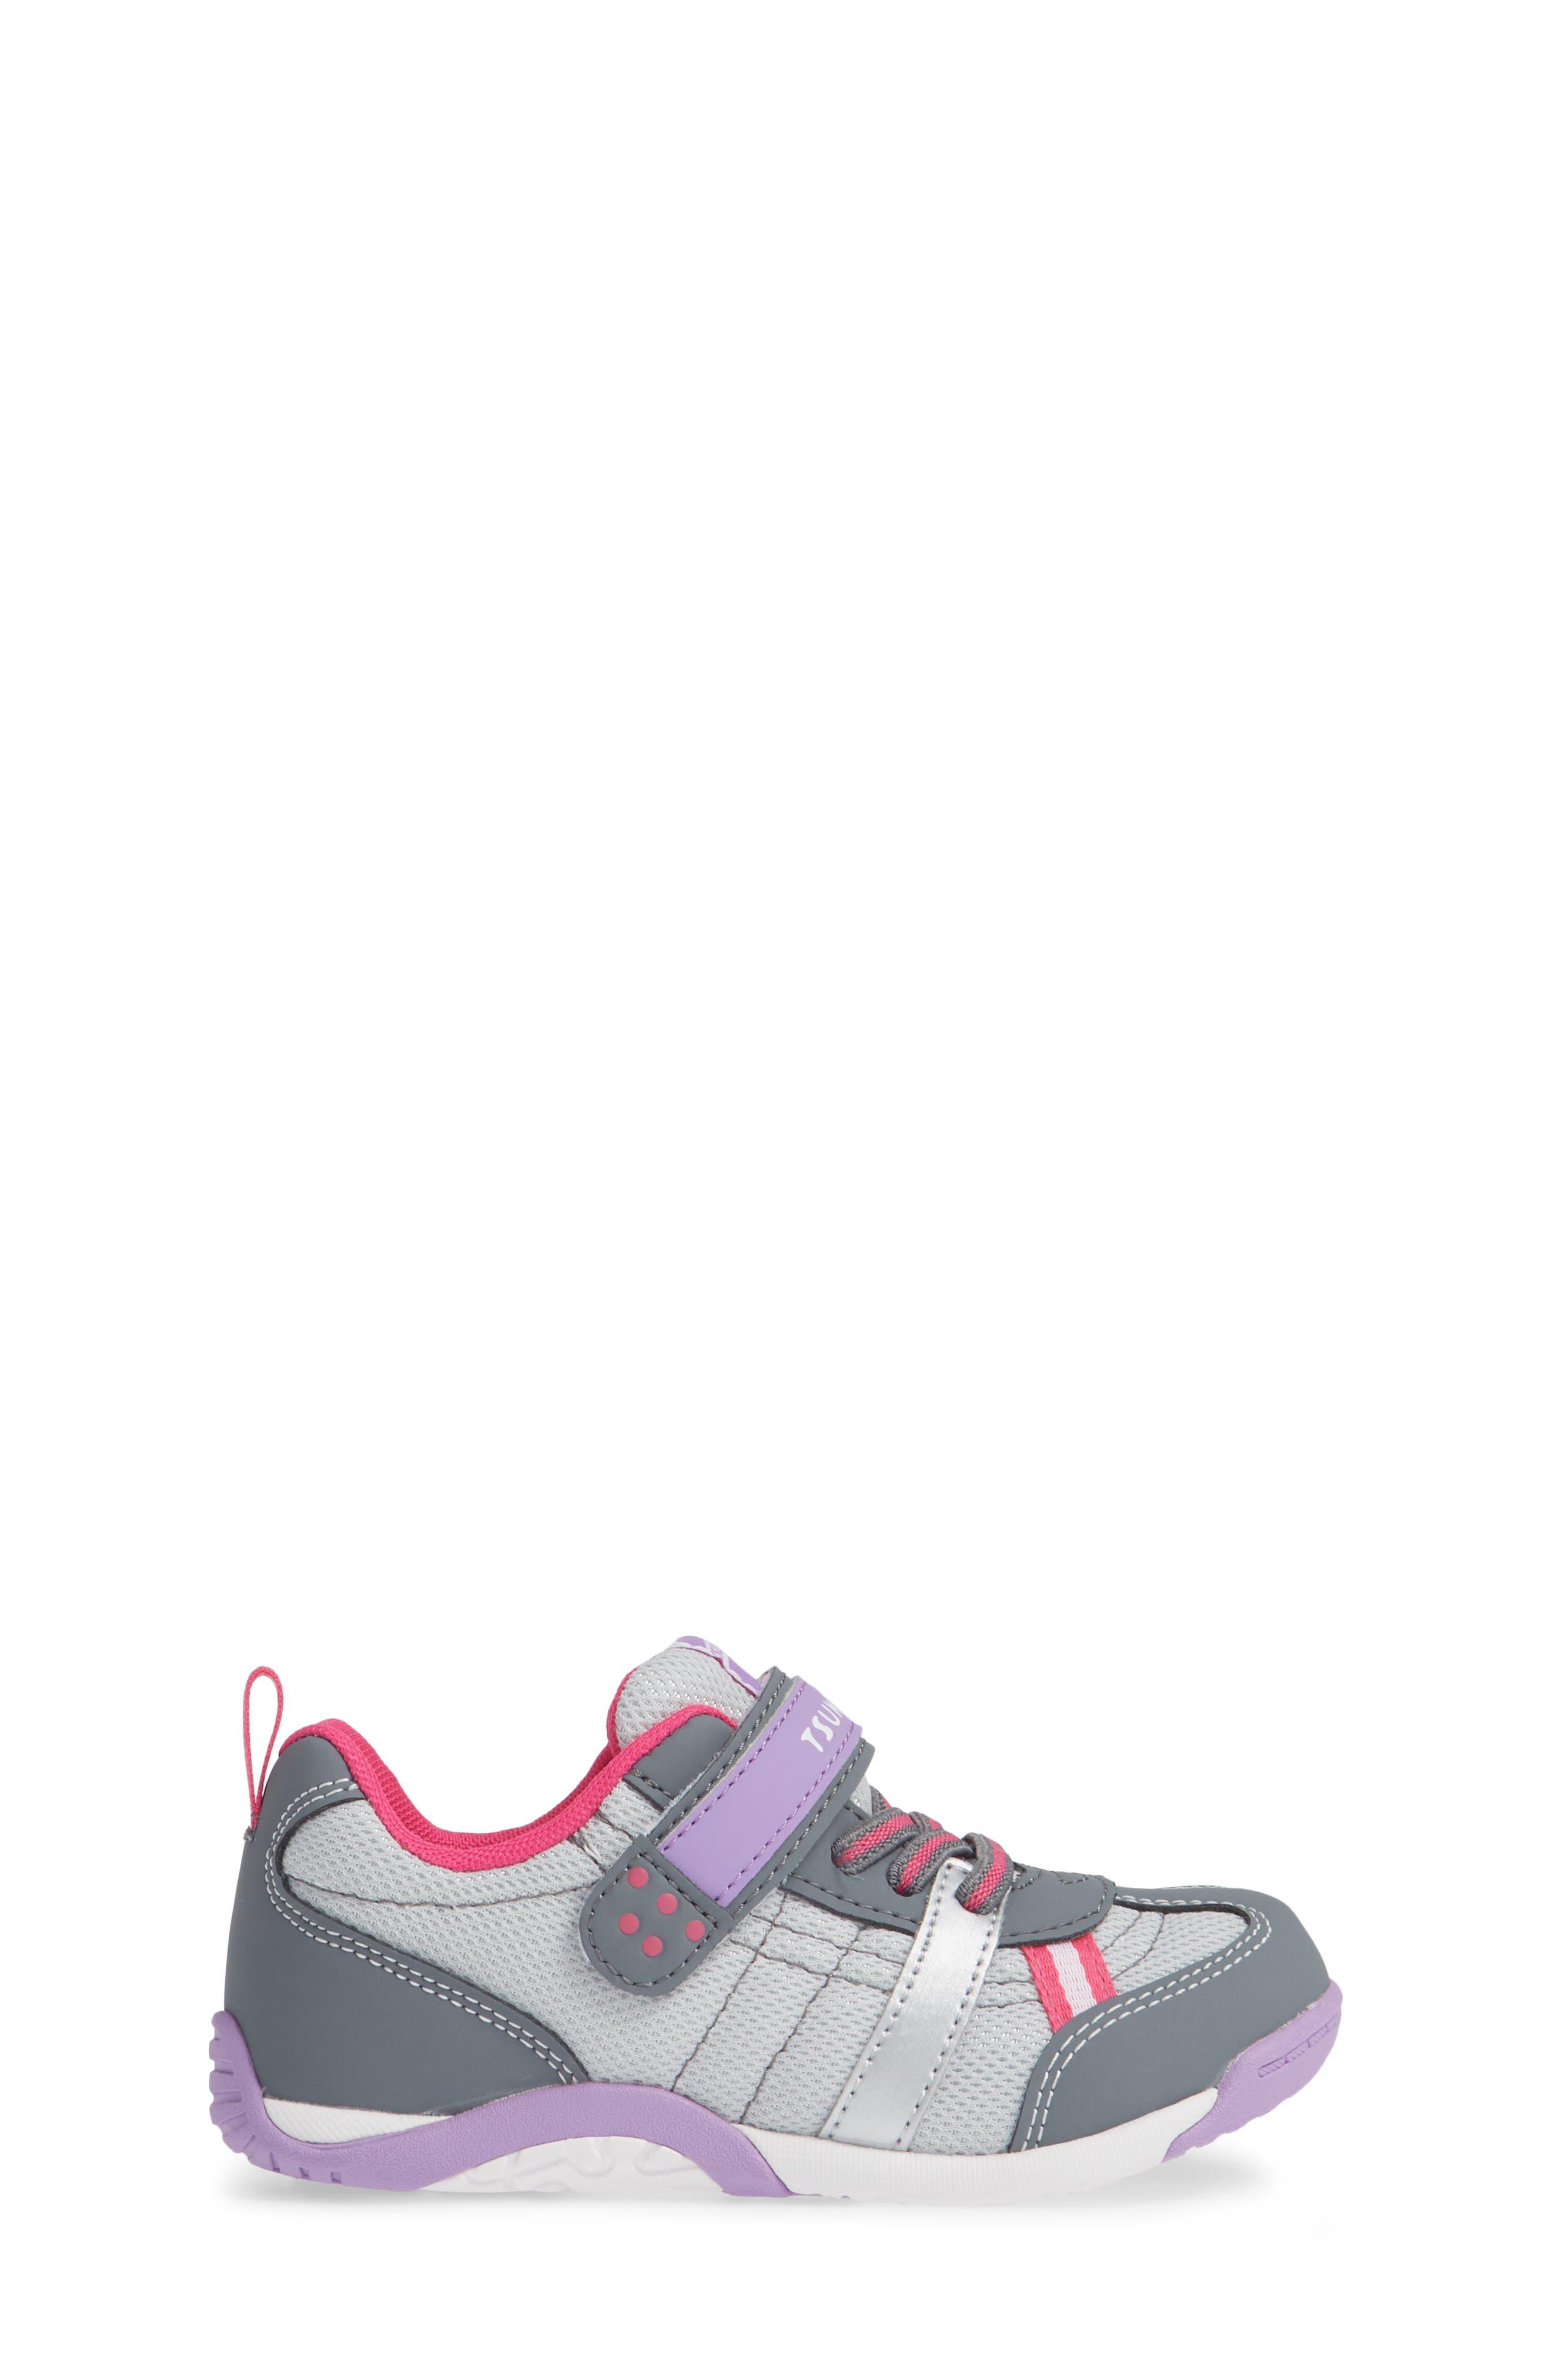 Kaz Washable Sneaker,                             Alternate thumbnail 3, color,                             Gray/ Purple